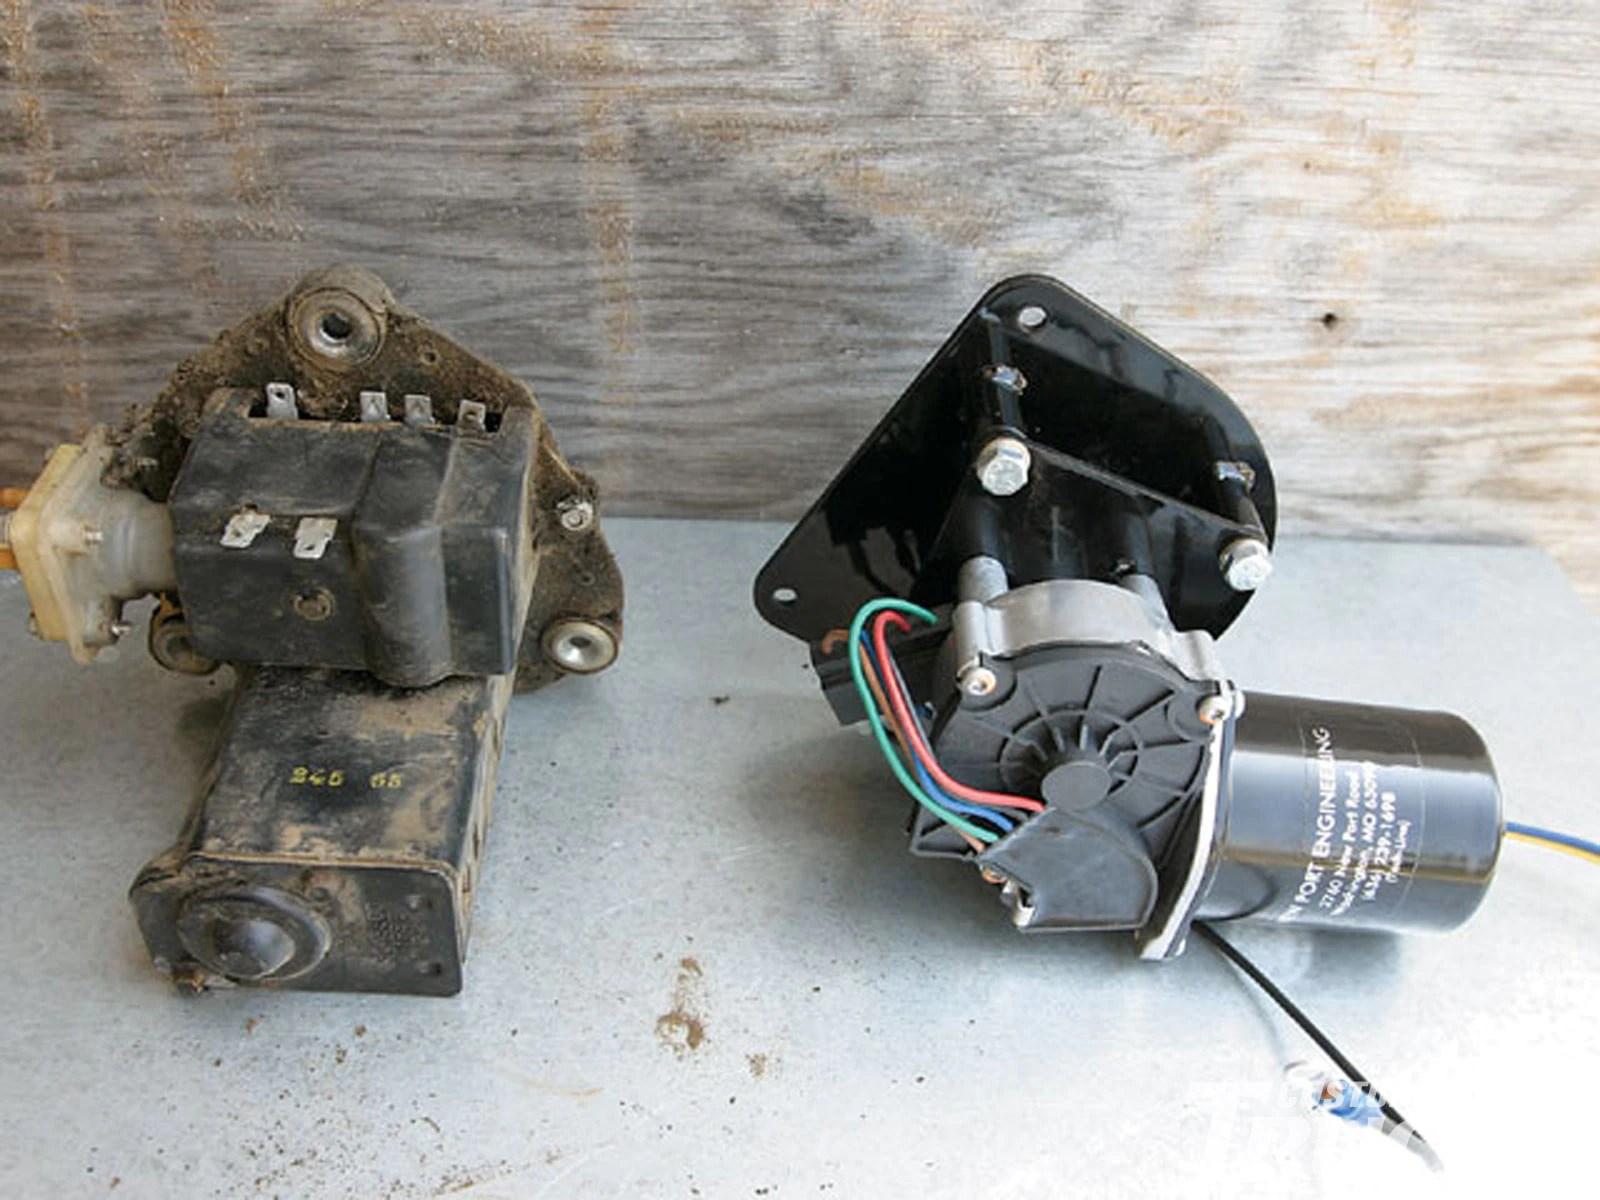 1965 Chevrolet C20 Truck Wiring Diagram 1960 66 Chevy C10 Wiper Upgrade Hot Rod Network